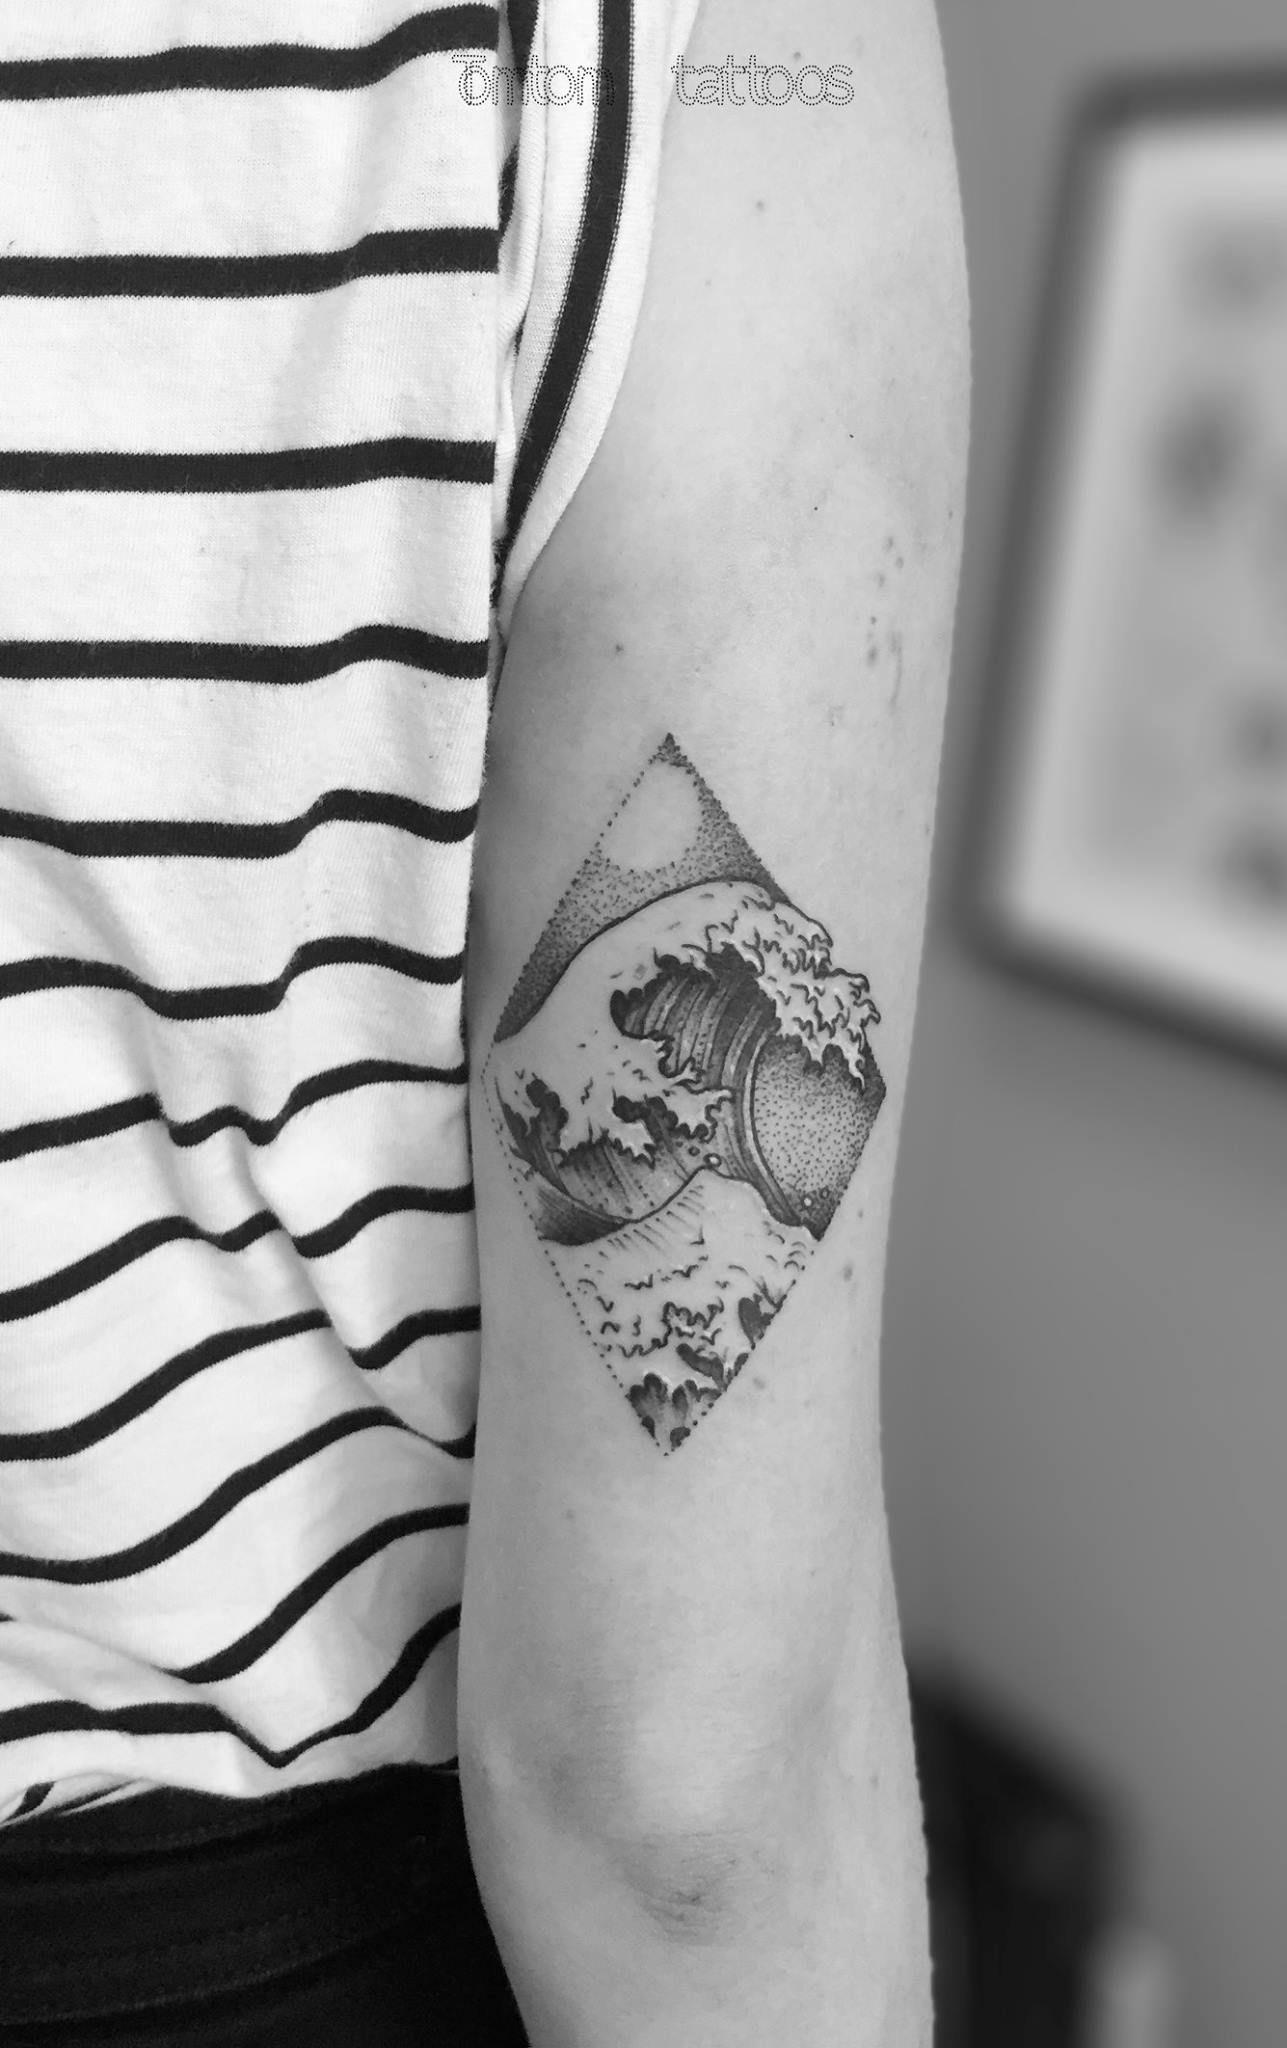 The Great Wave Tomtom Tattoos Tattoos Pinterest Tattoos